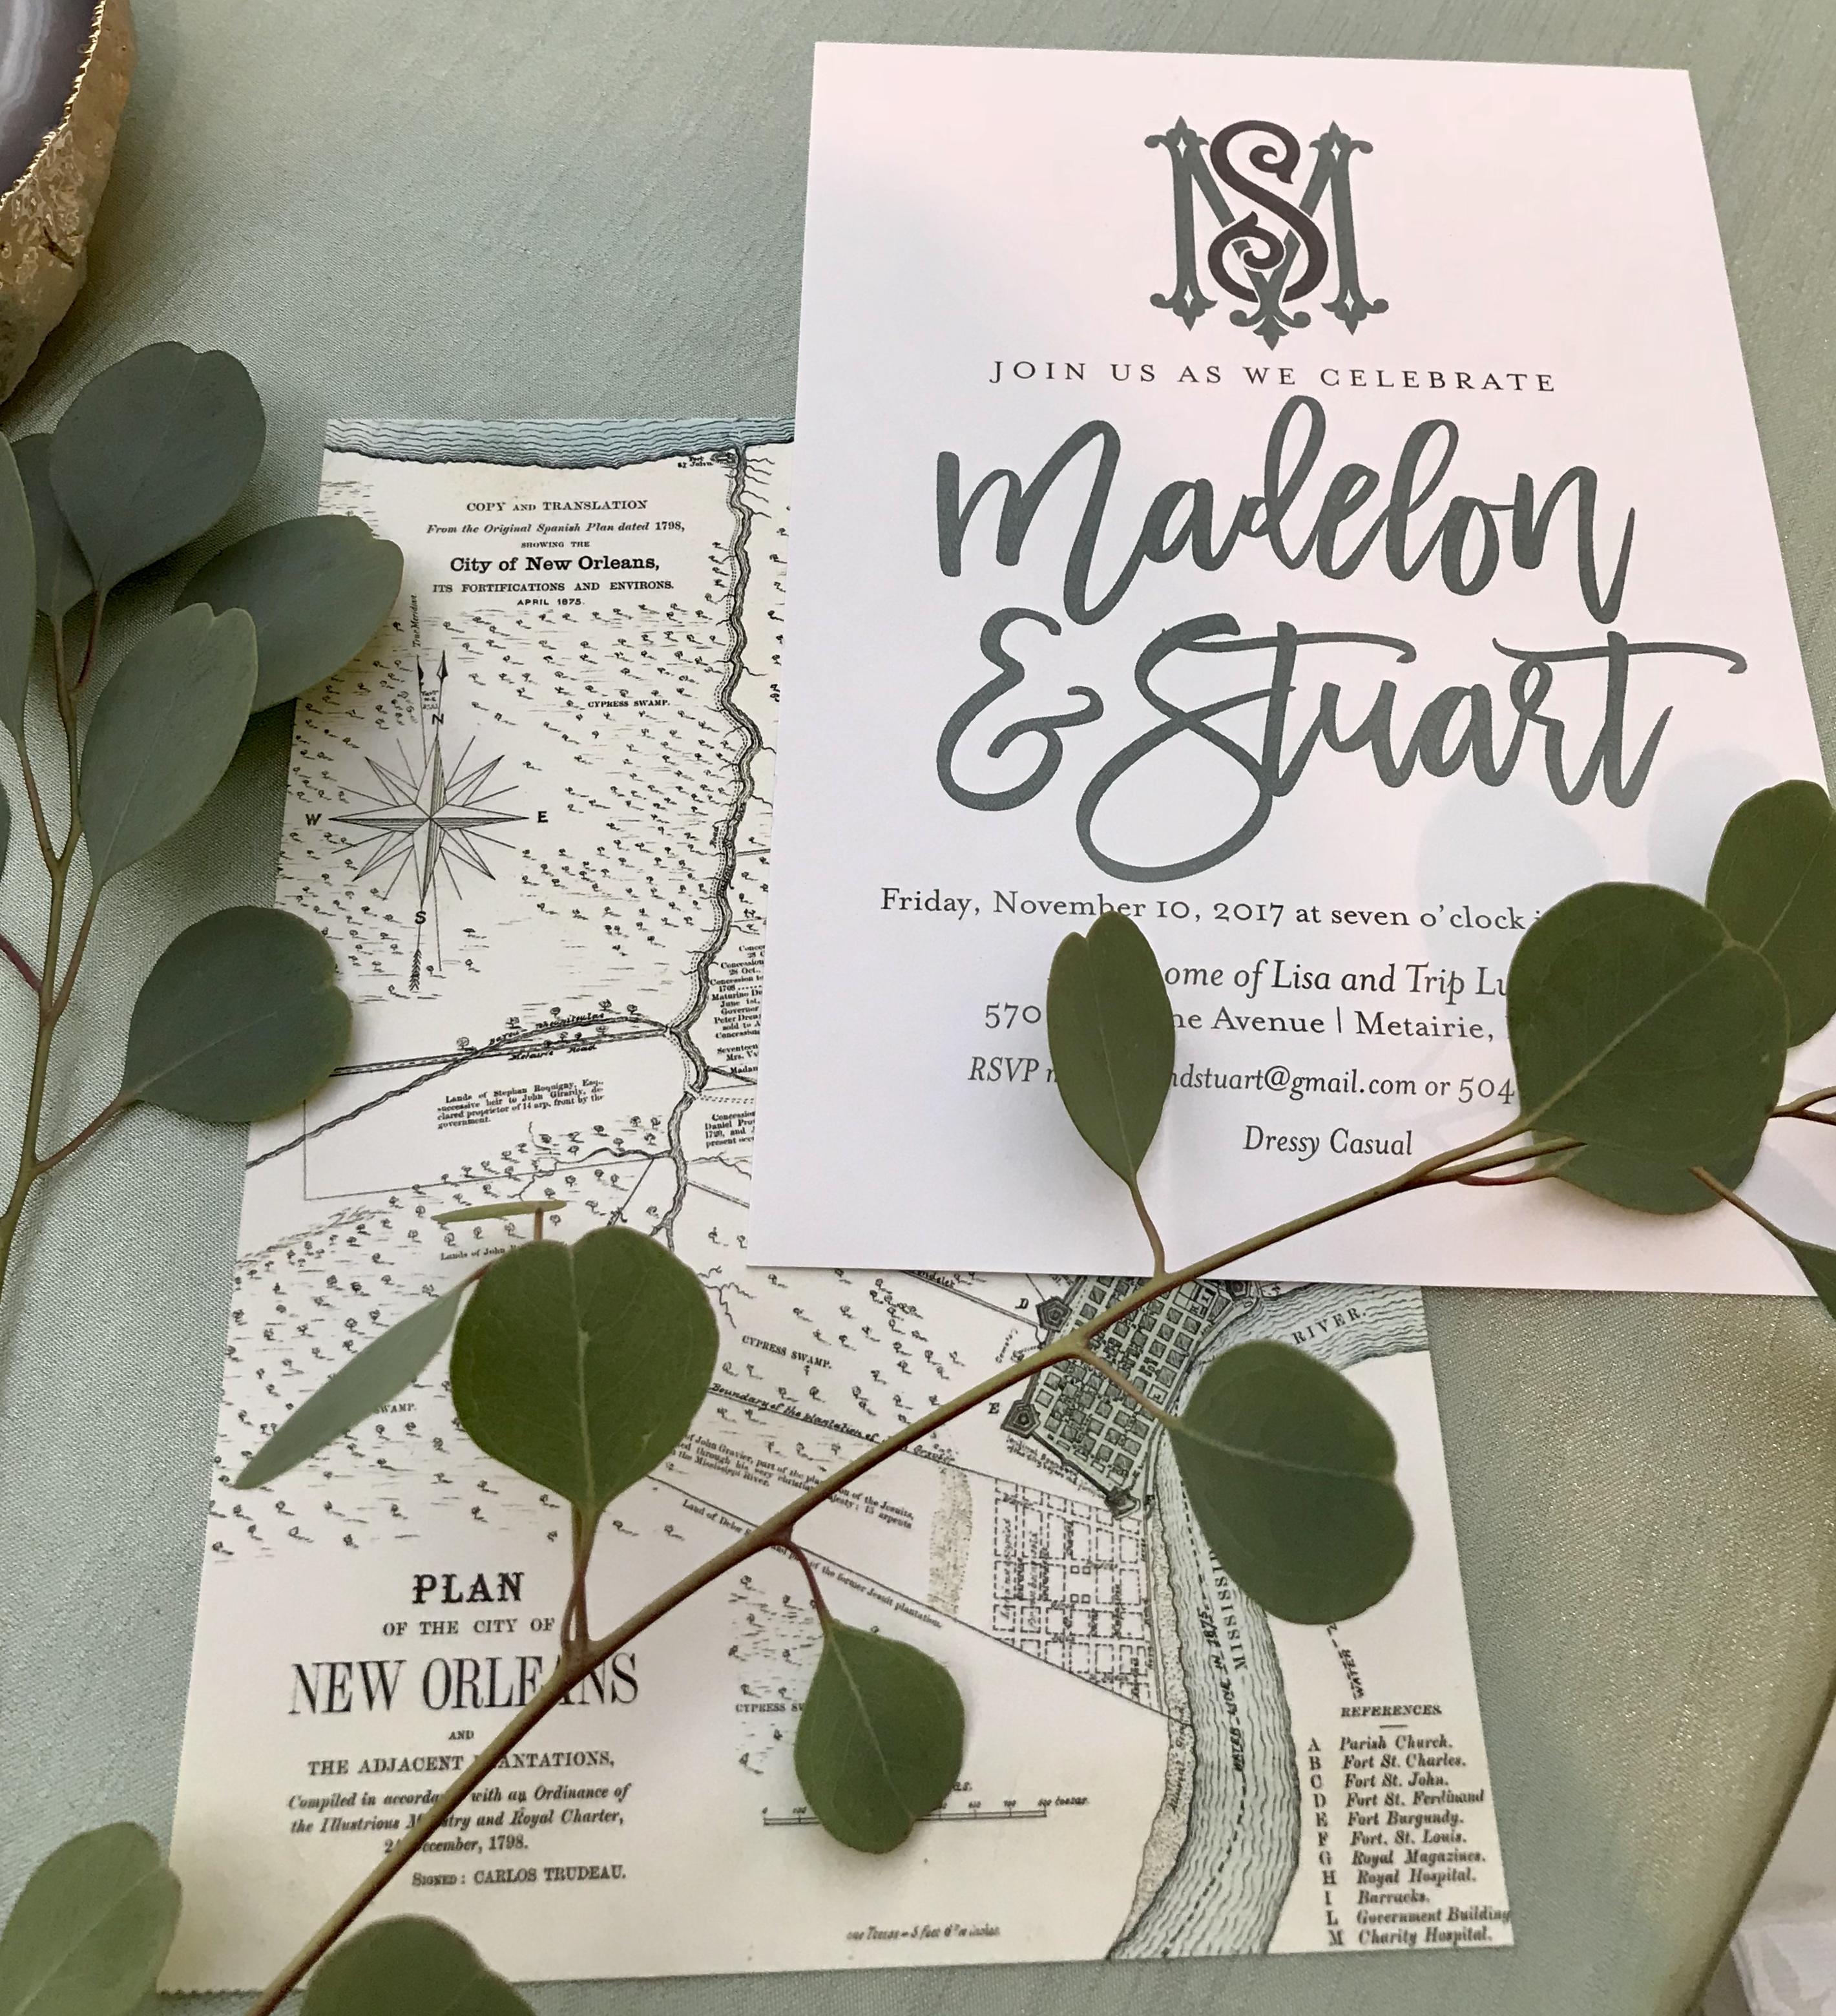 Custom invitations and graphics designed Z Event Company and local graphic designer